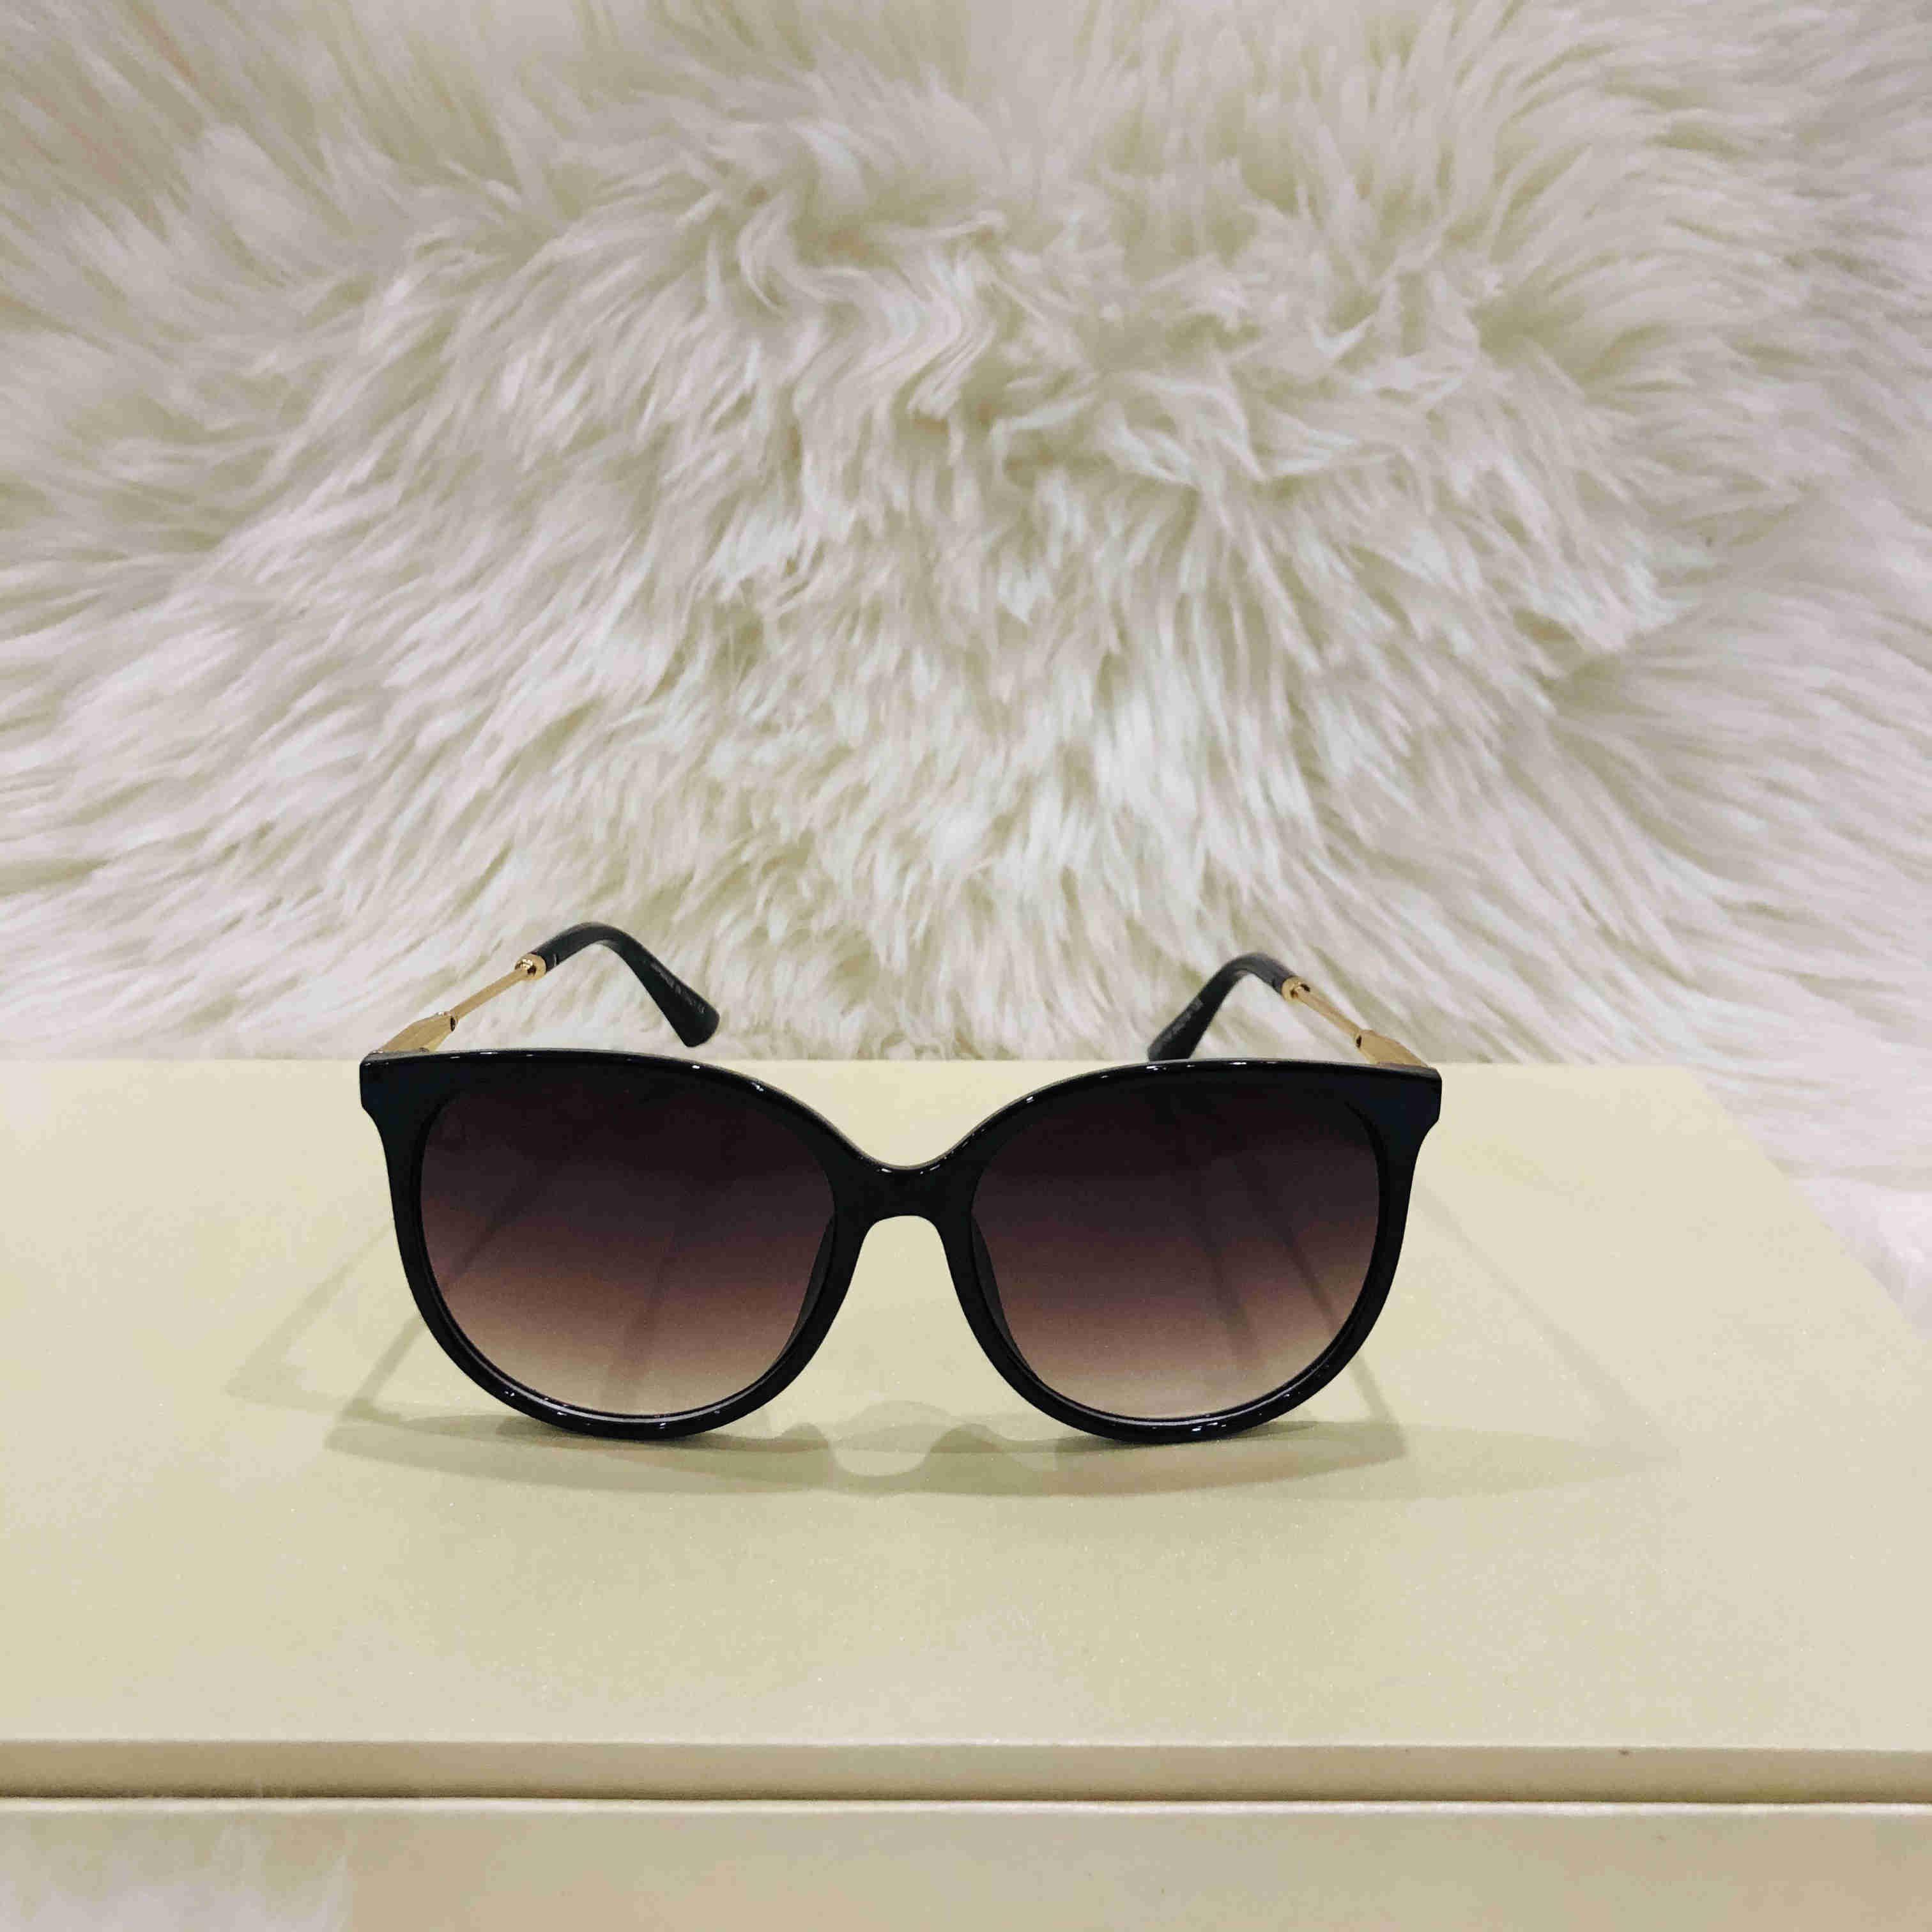 1719 Designer Sunglass Occhiali da sole Occhiali da vista Outdoor Shades PC Frame Fashion Classic Lady Occhiali da sole Specchi per le donne Occhiali da sole di lusso